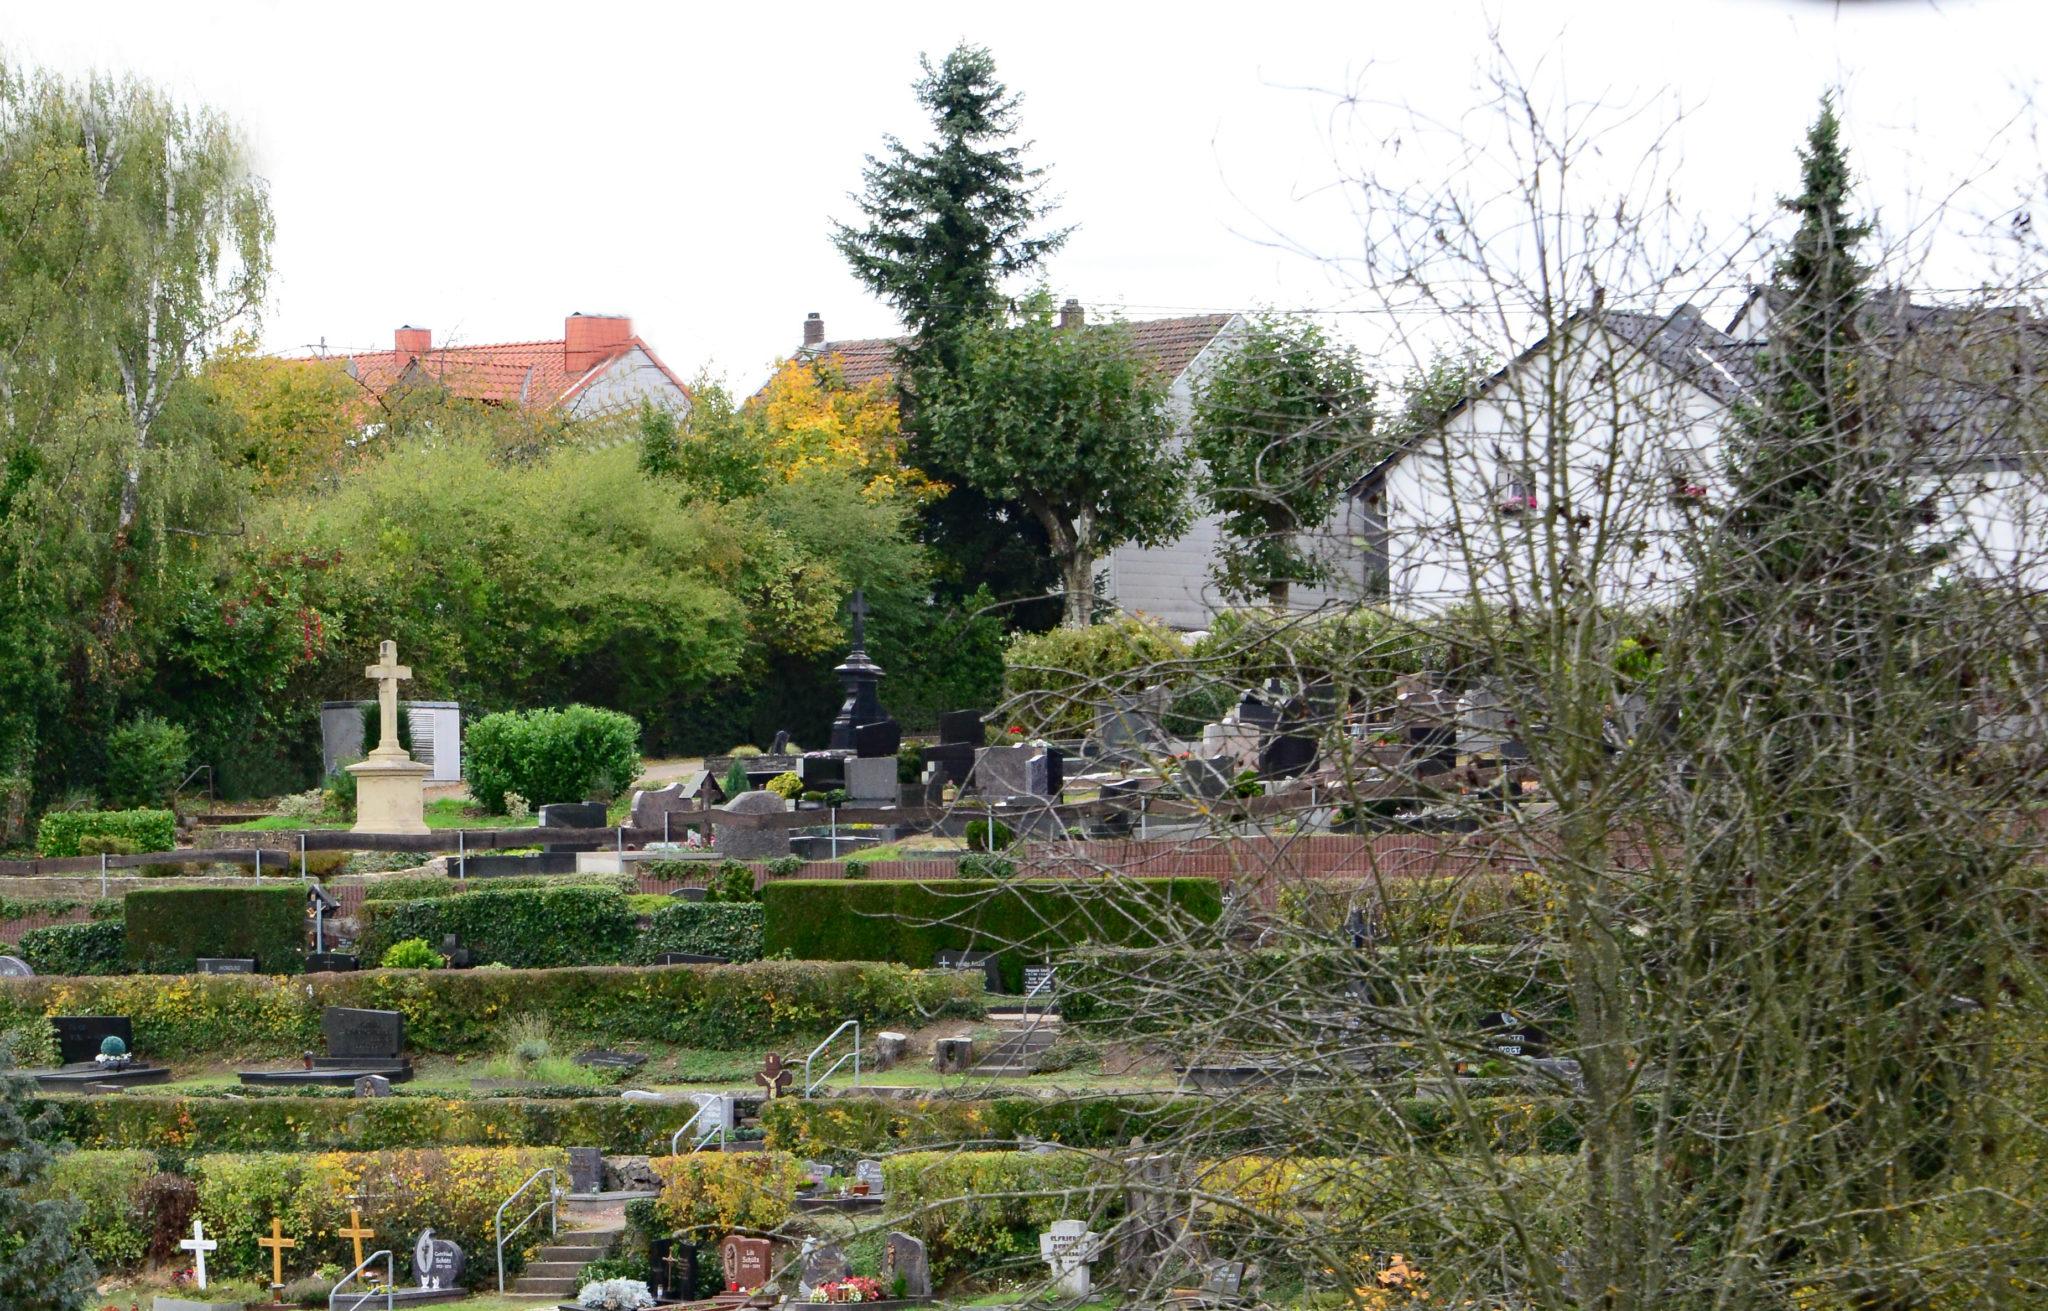 zu sehen ist ein Ausschnitt des Bouser Friedhofs